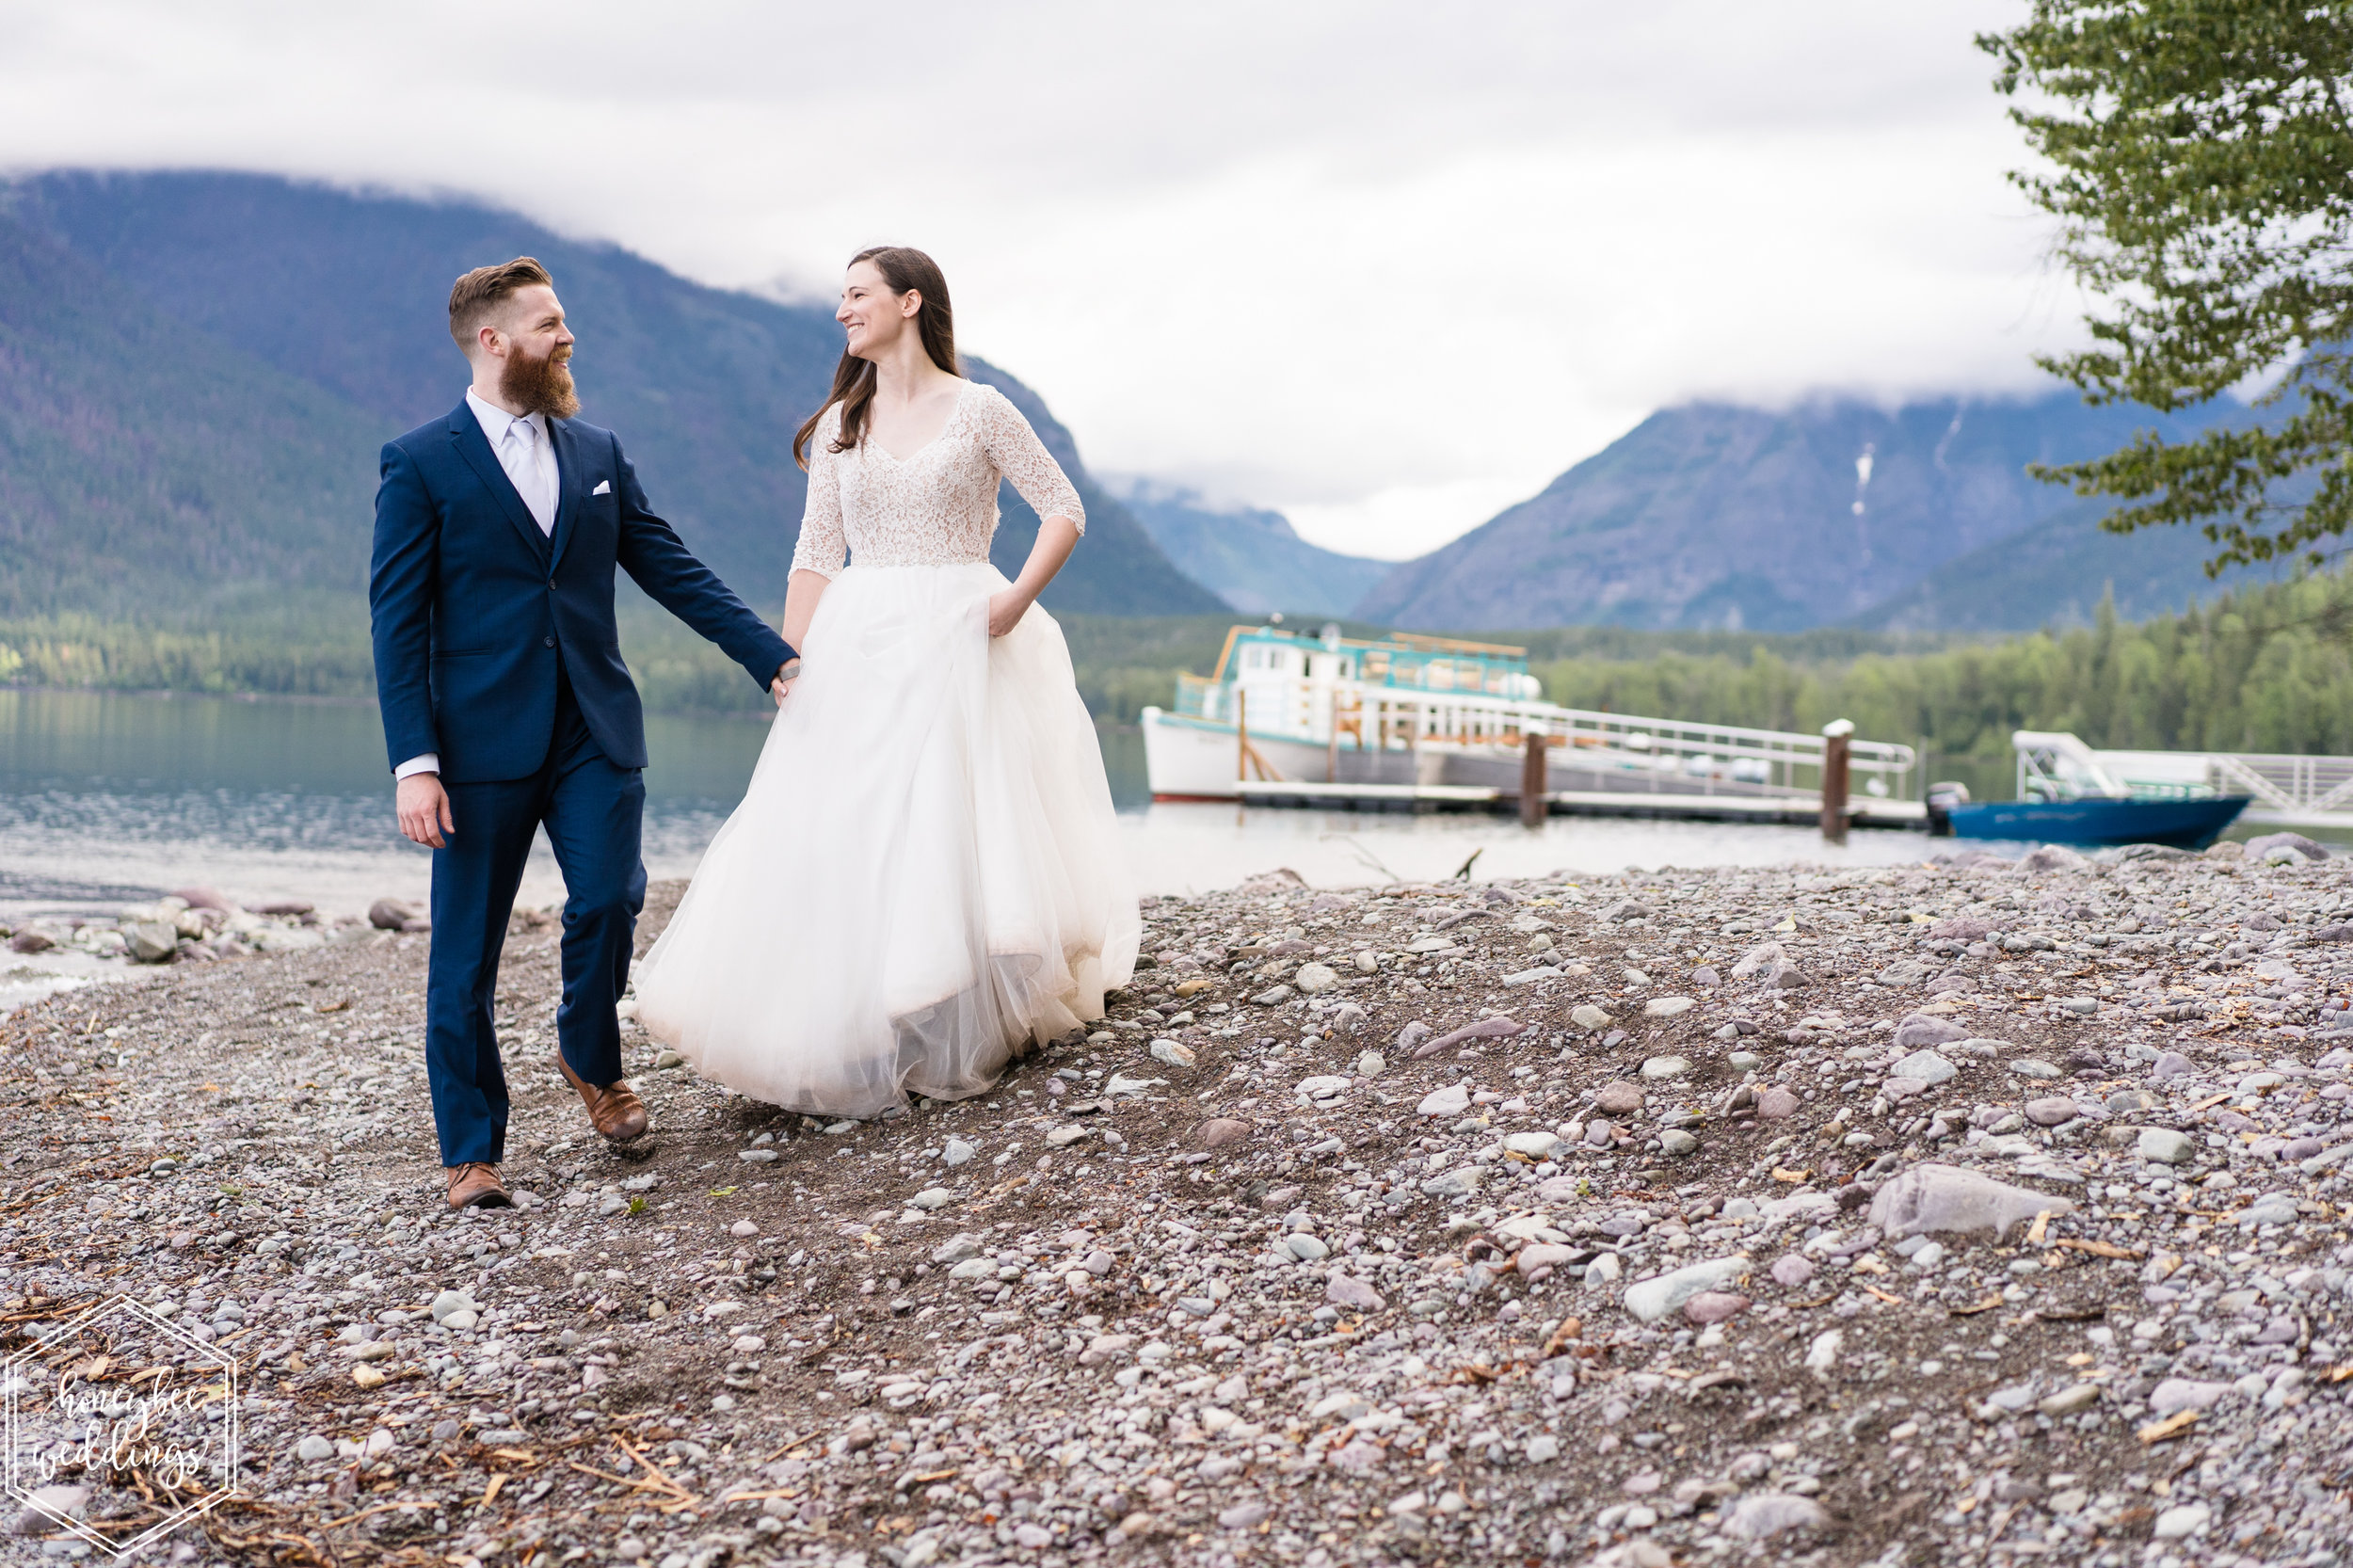 287Glacier National Park Wedding_Izaak Walton Inn Wedding_Honeybee Weddings_Norah & Kyle_June 09, 2019-140.jpg